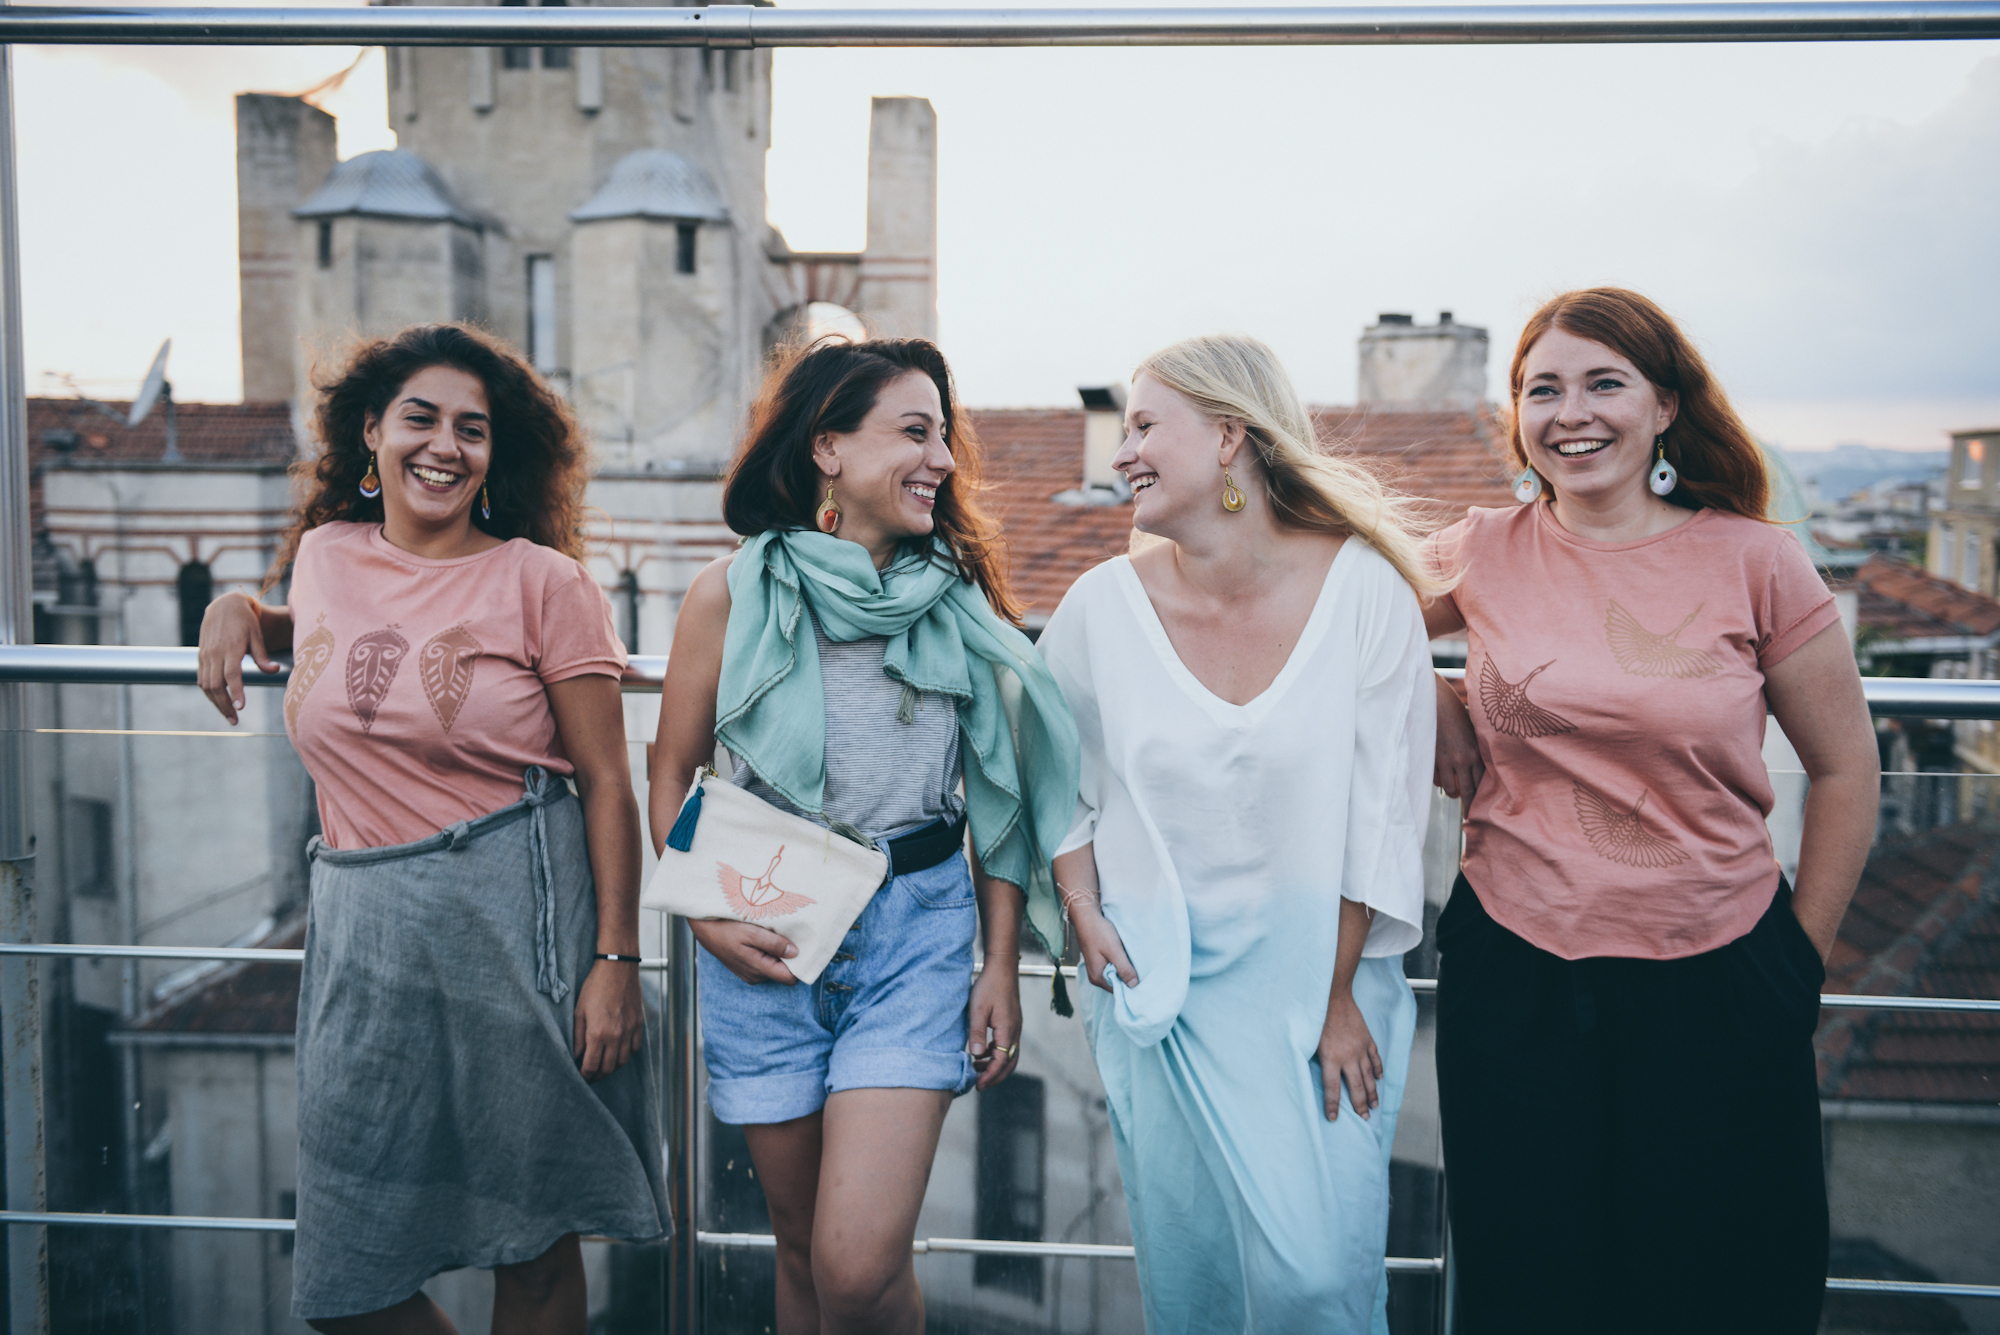 Models from left to right: Konstantina, Lauren Simcic, Emilie Kleding Rasmussen, Aylin